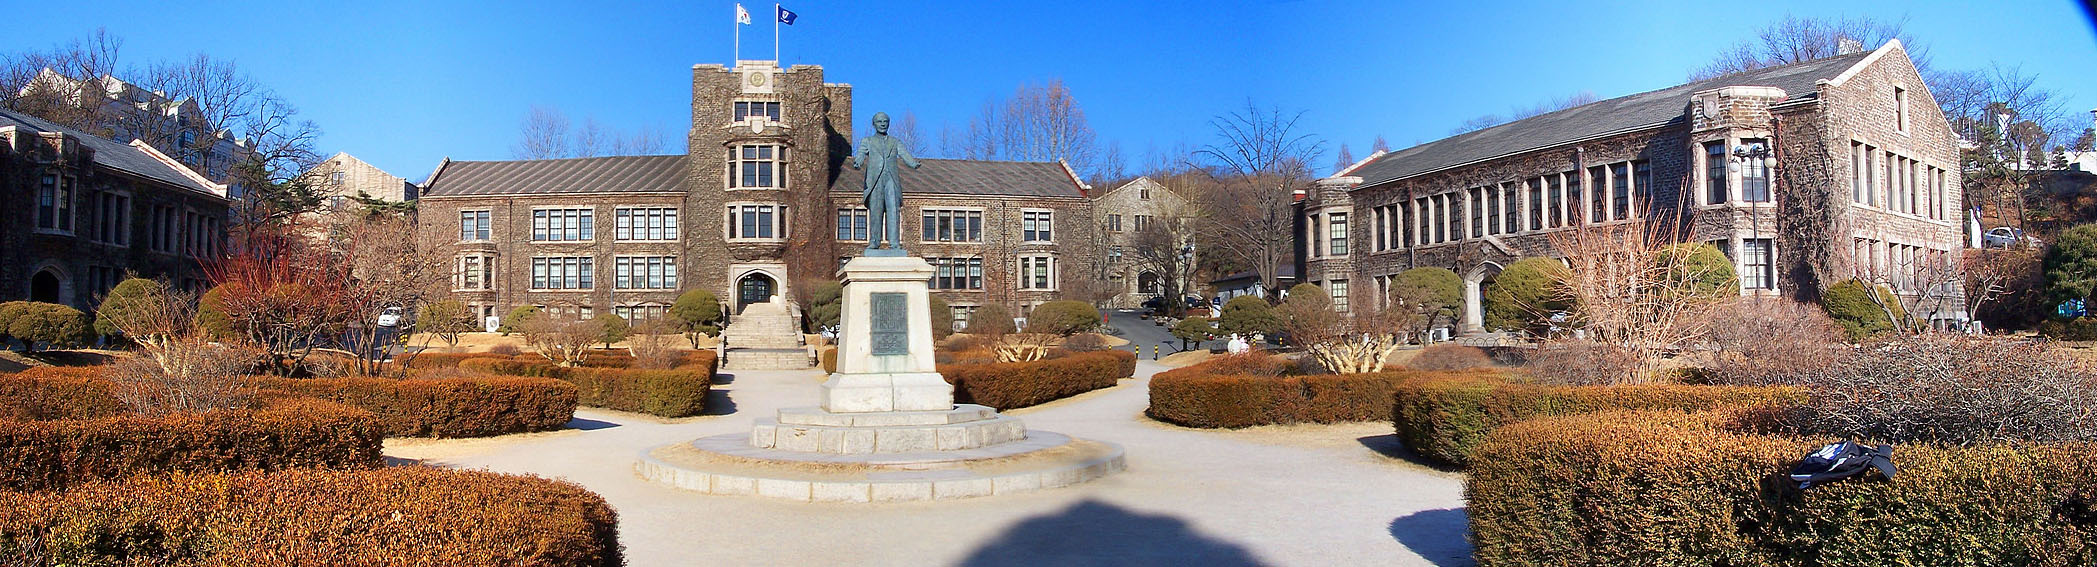 Yonsei University Building